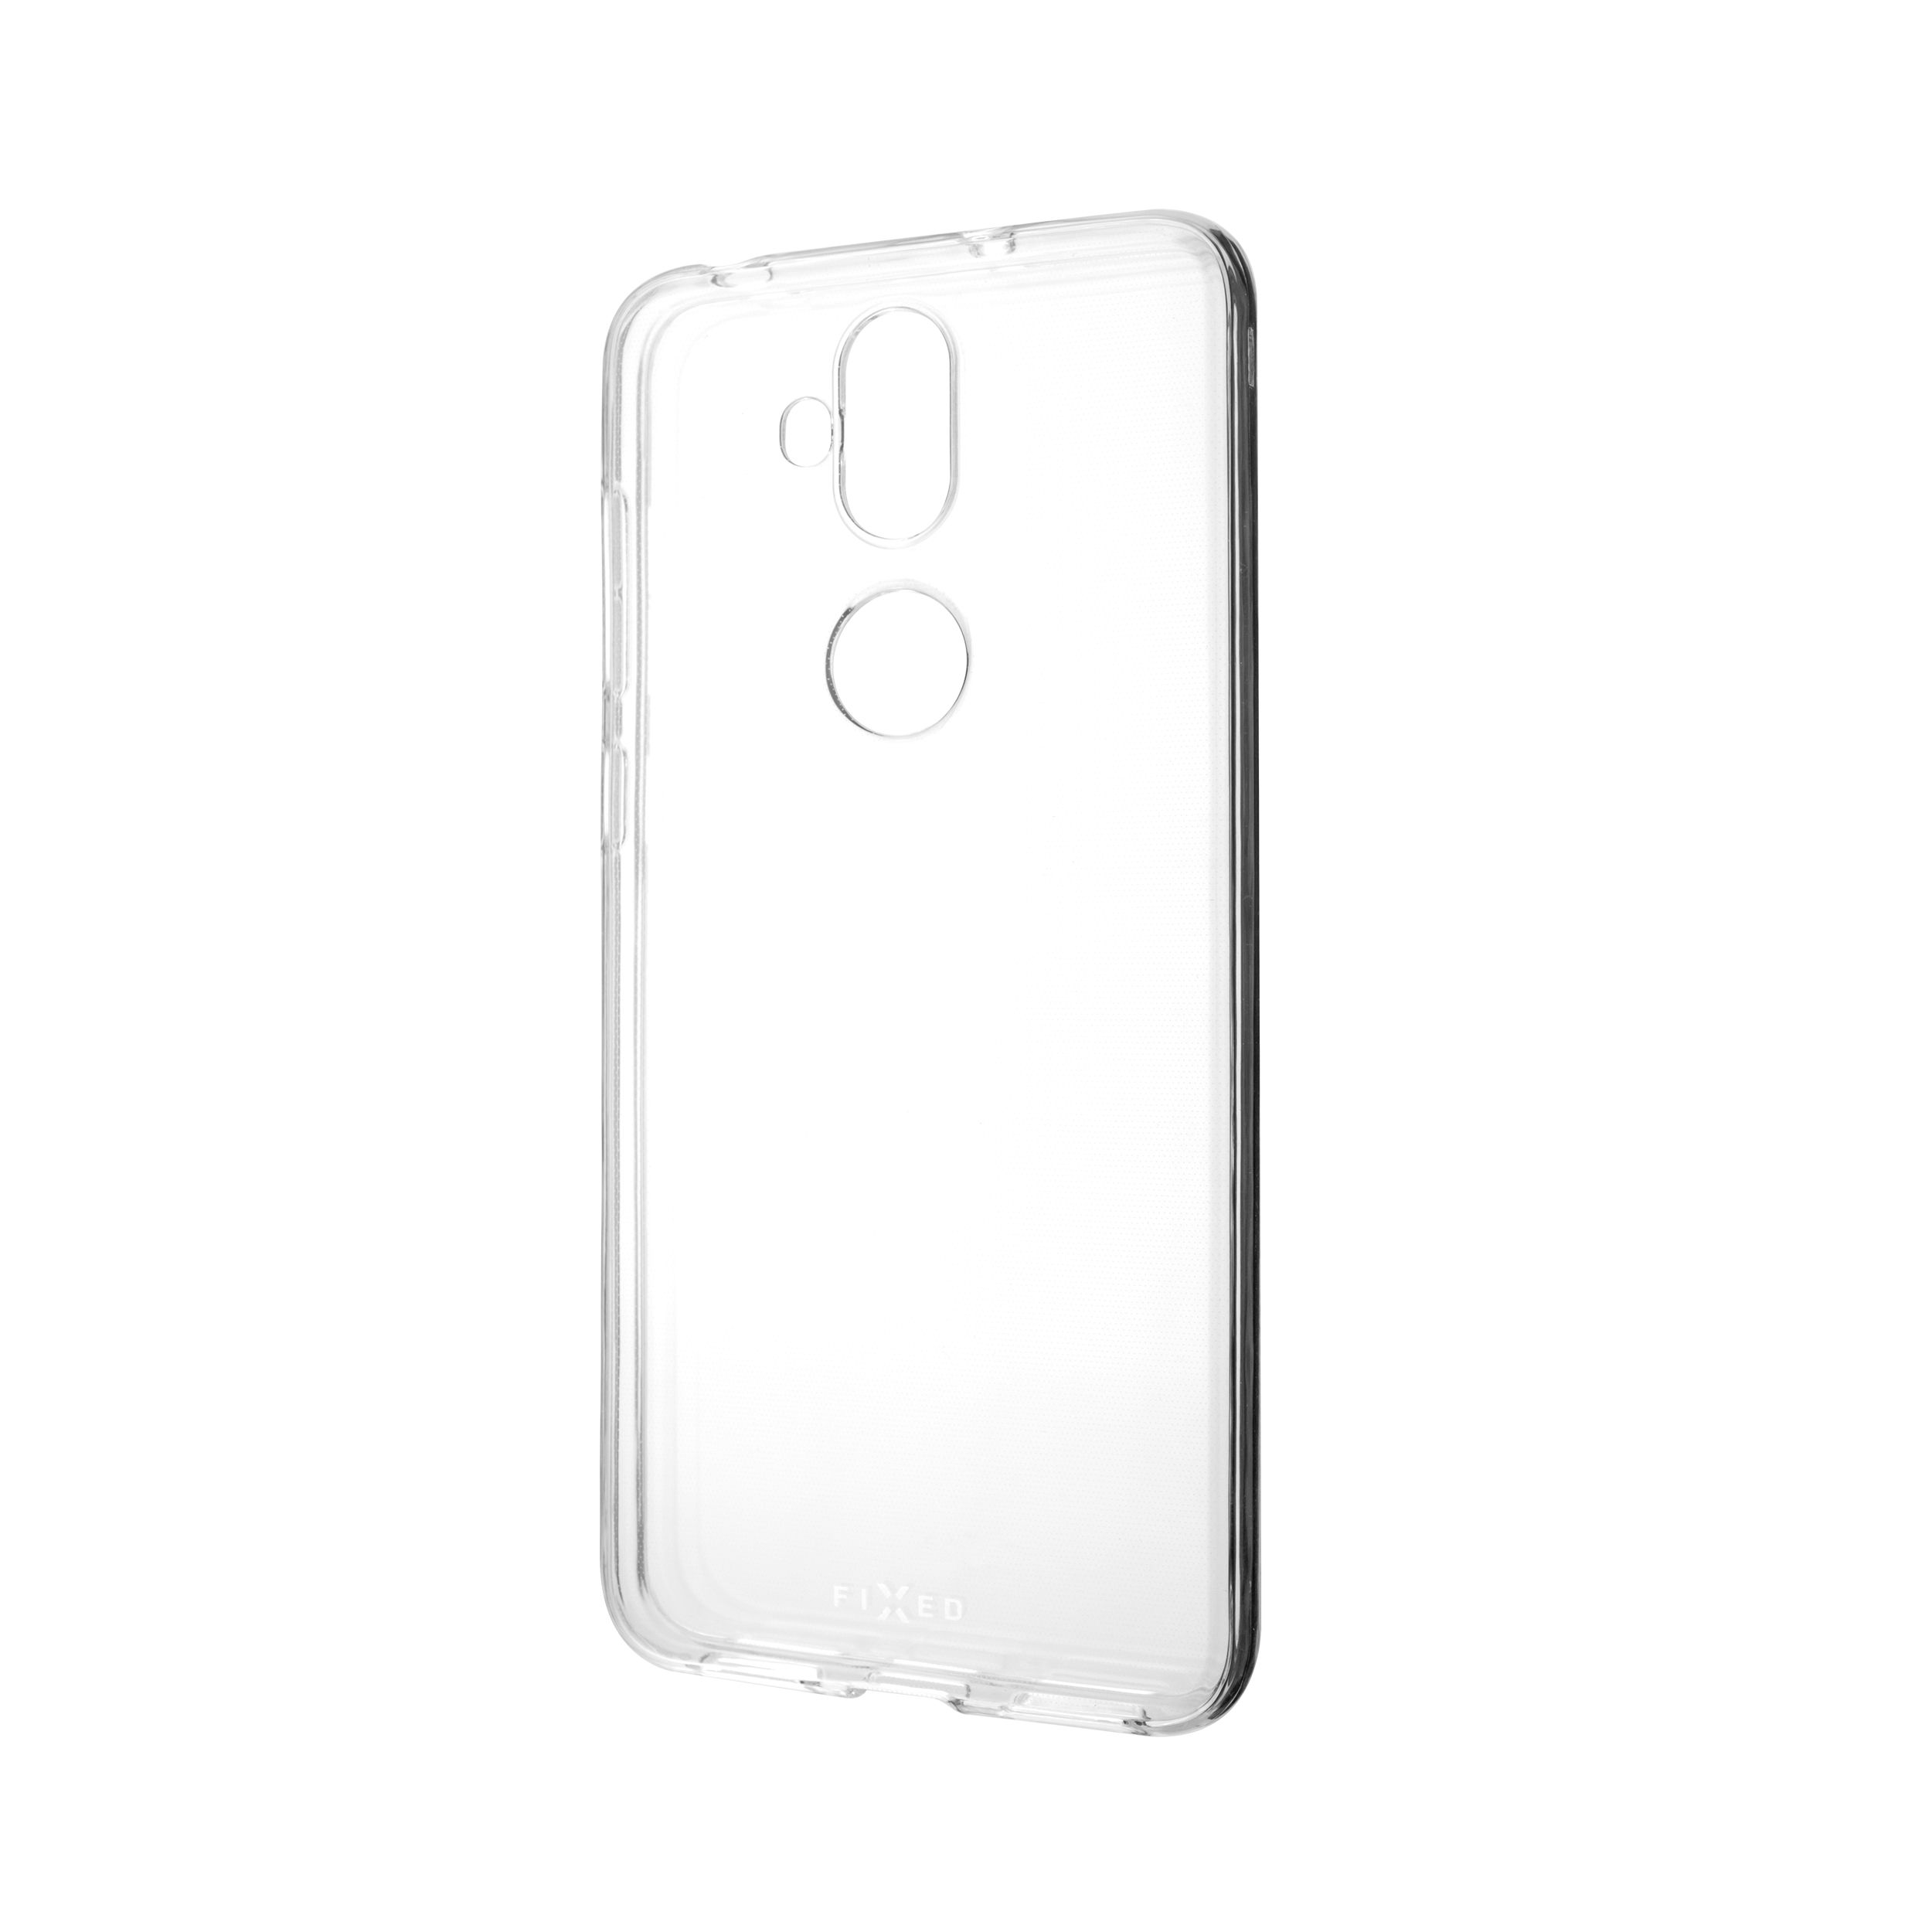 Silikonové pouzdro FIXED pro ASUS ZenFone 5 Lite (ZC600KL), čiré